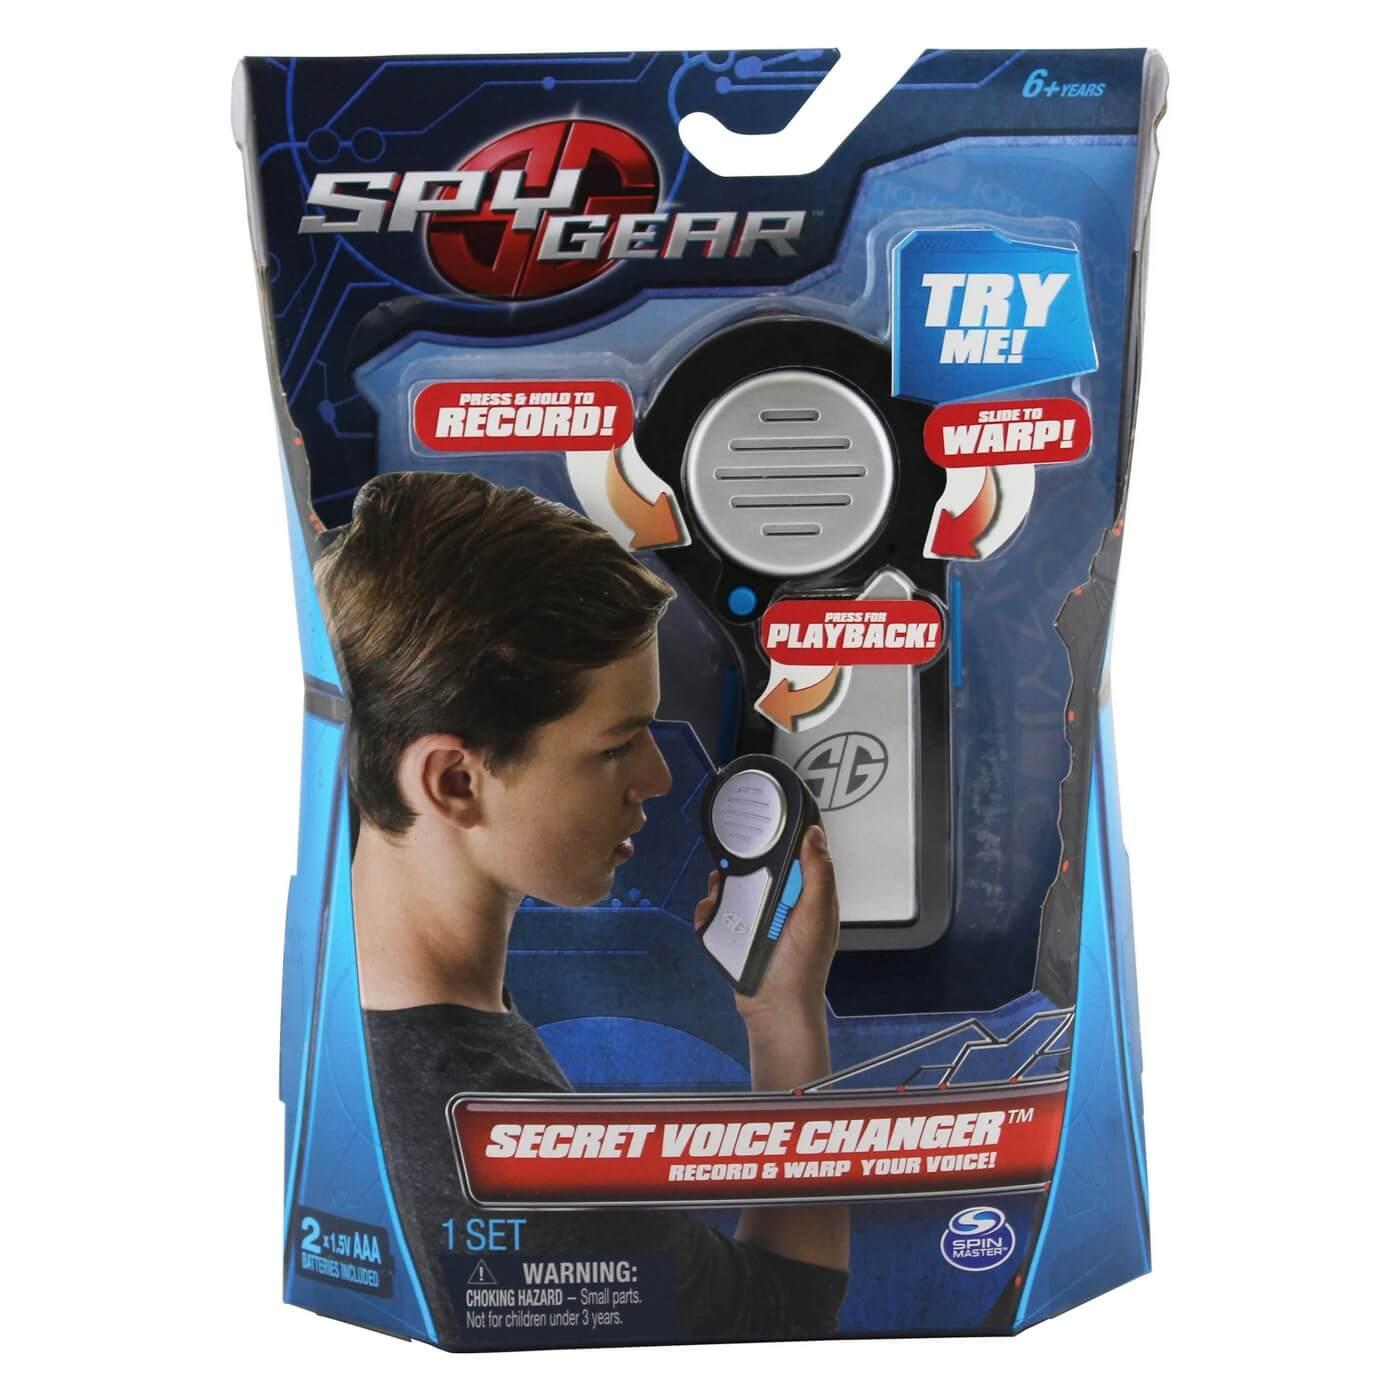 Spygear I-nite clip-on night vision camera